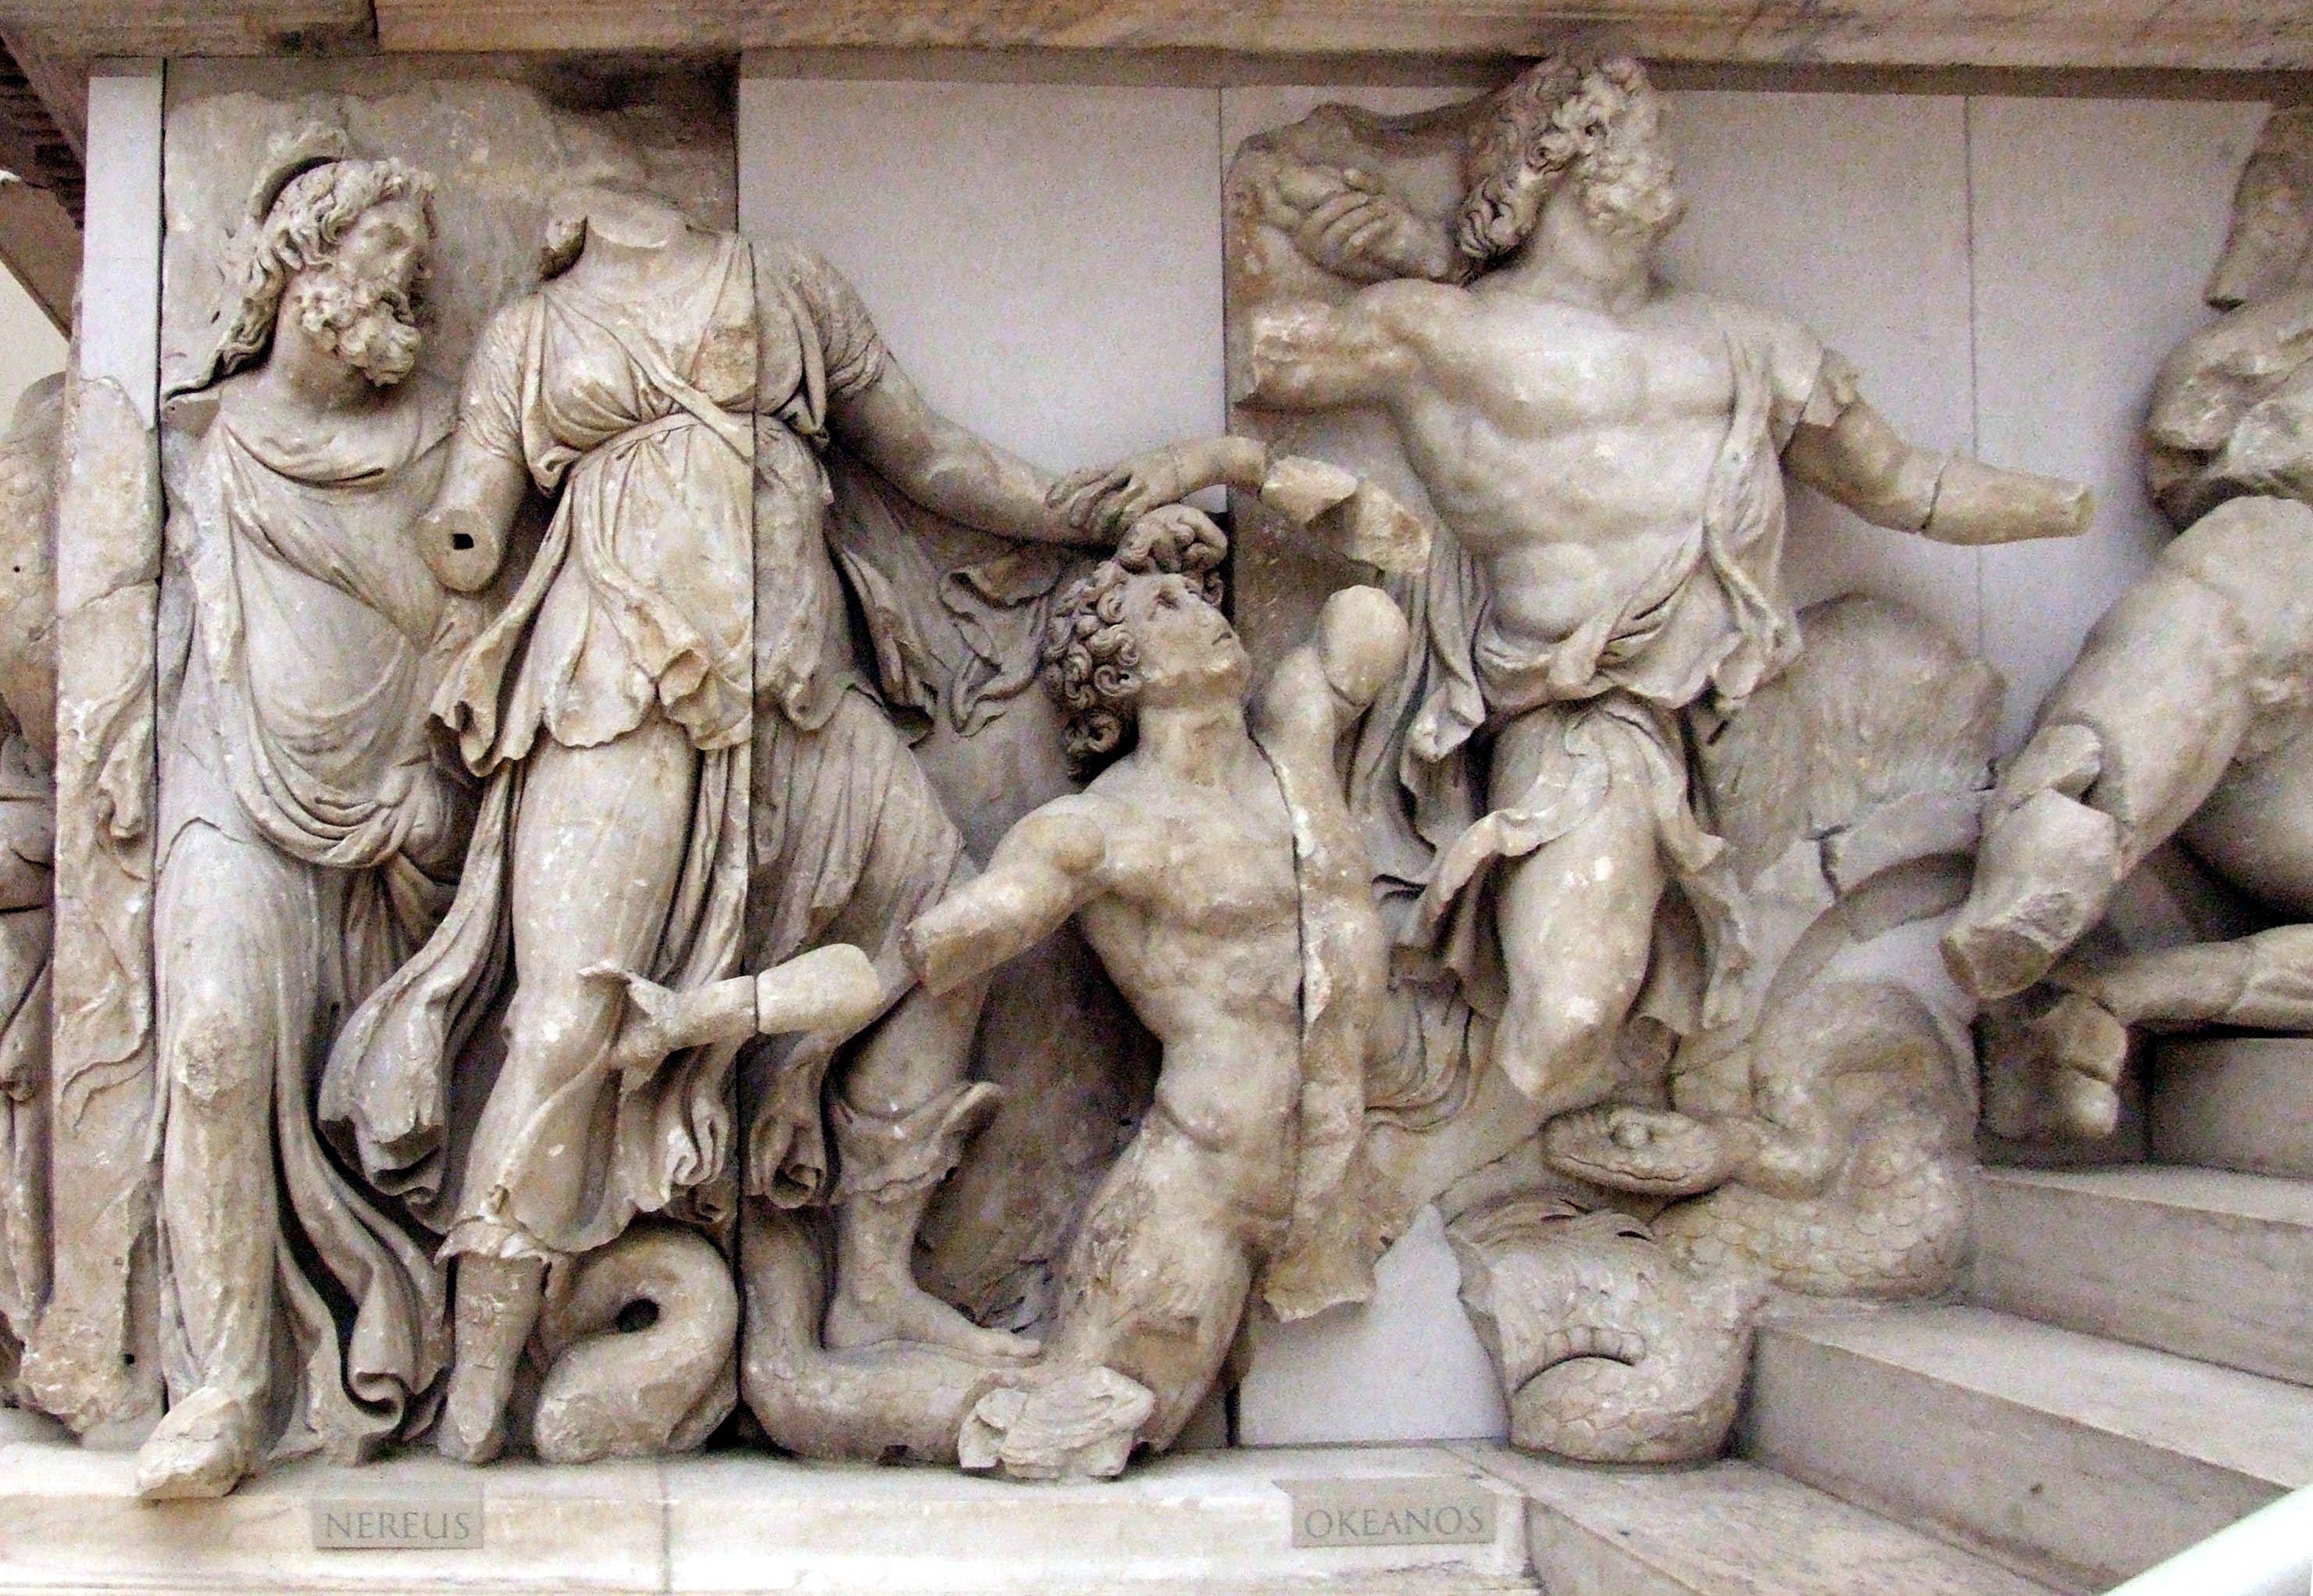 Ancient Gaia Statue océan ou océanos est un titan, fils d'ouranos et de gaïa